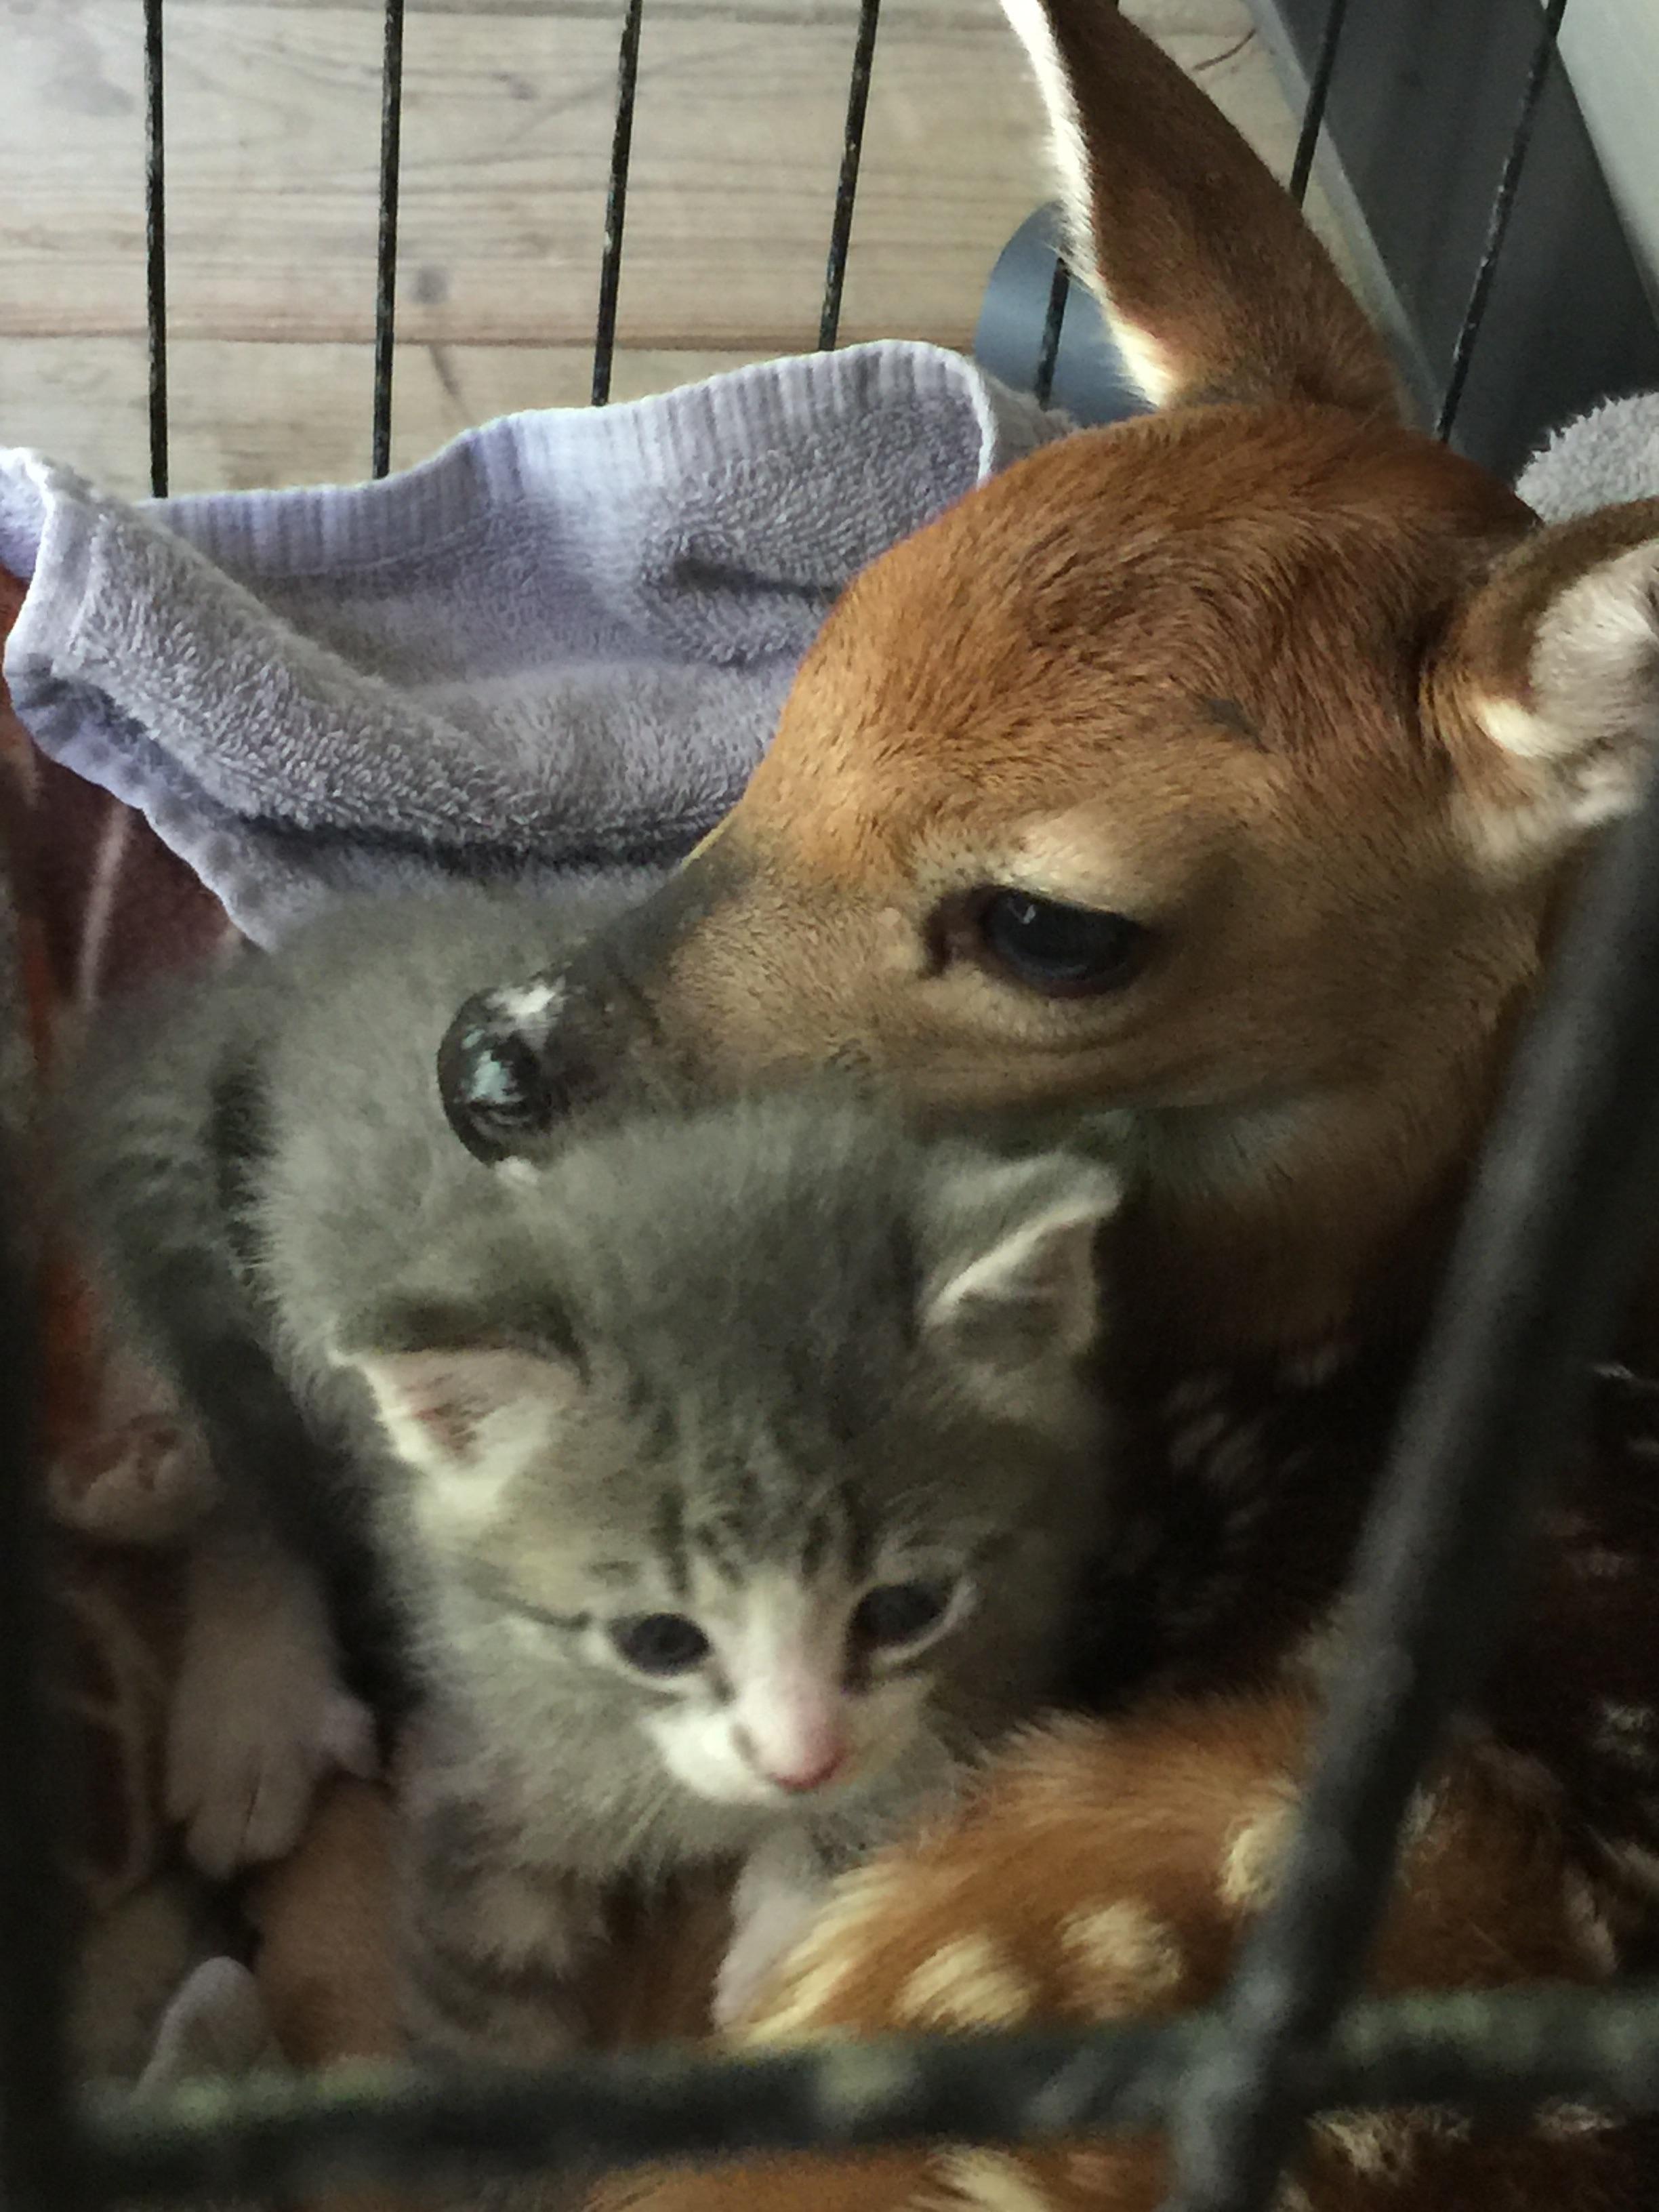 Baby Deer And Kitten Cuddles Https Ift Tt 2kxtp05 Cute Puppies Cats Animals Kitten Cuddle Baby Deer Baby Kittens